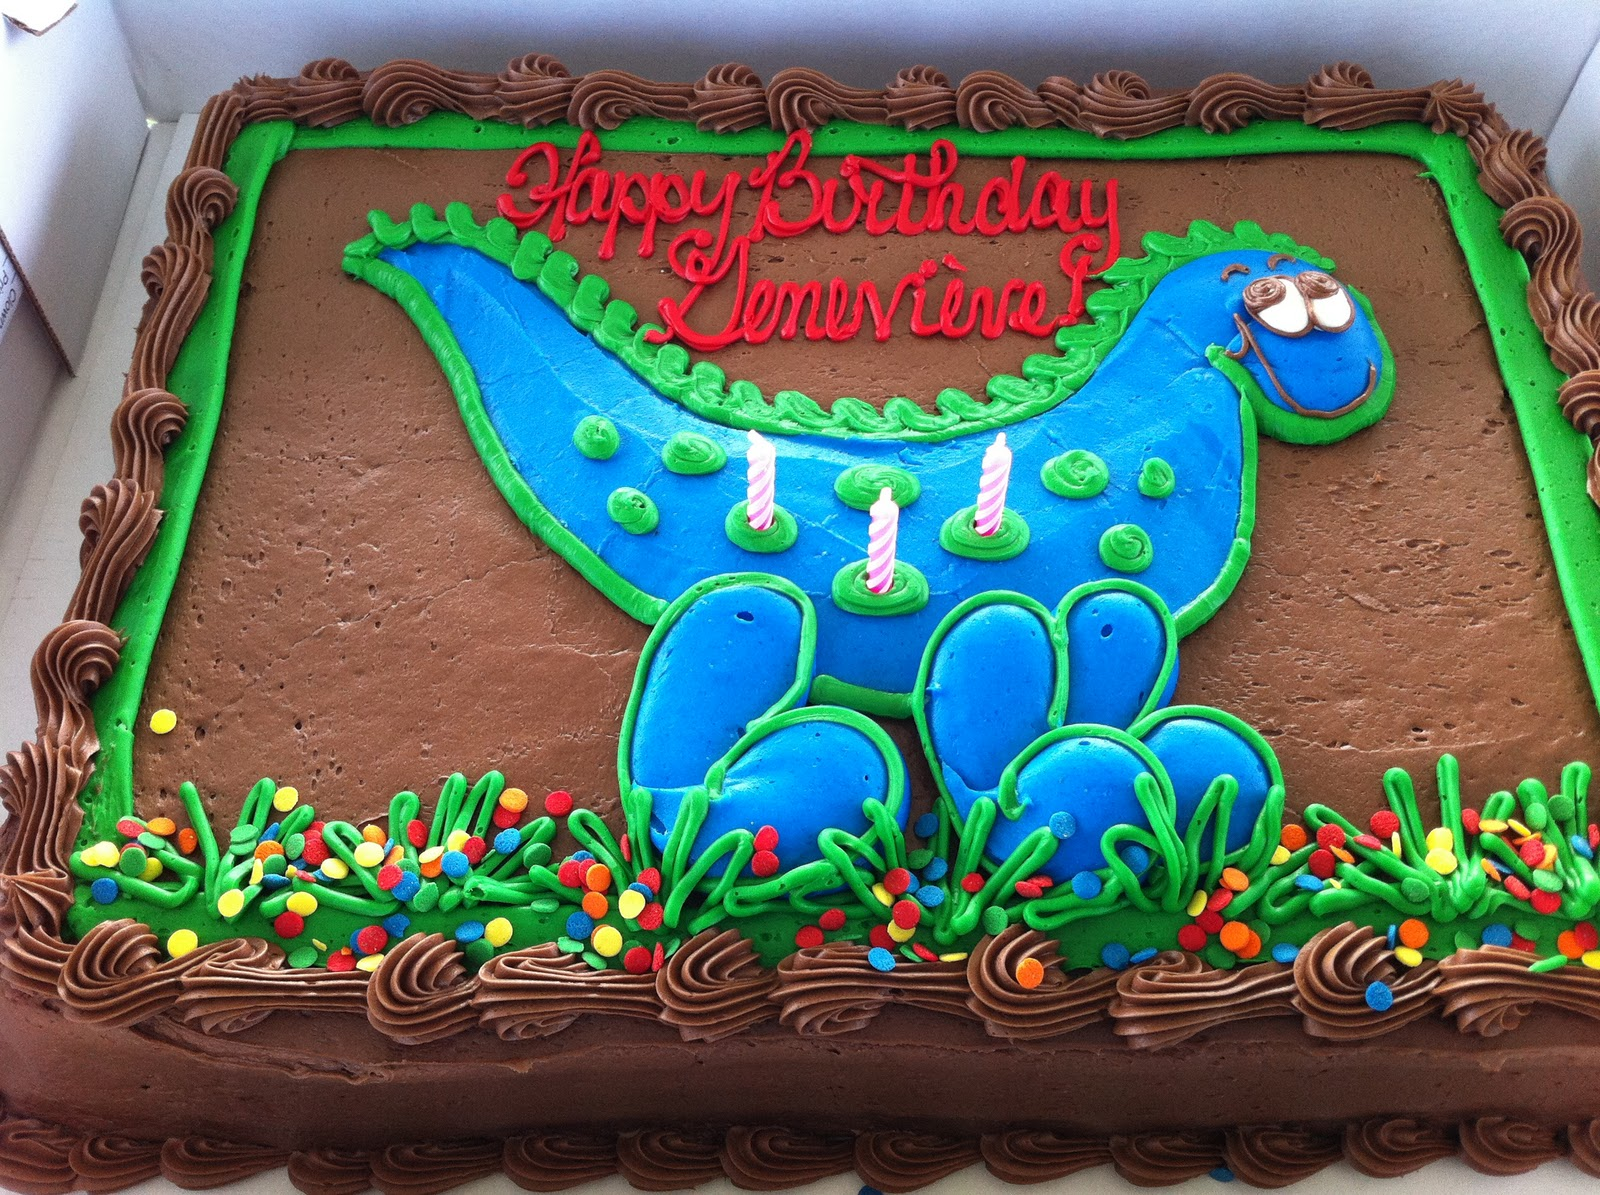 Idaho Becky Zsa Zsas Third Birthday and Party